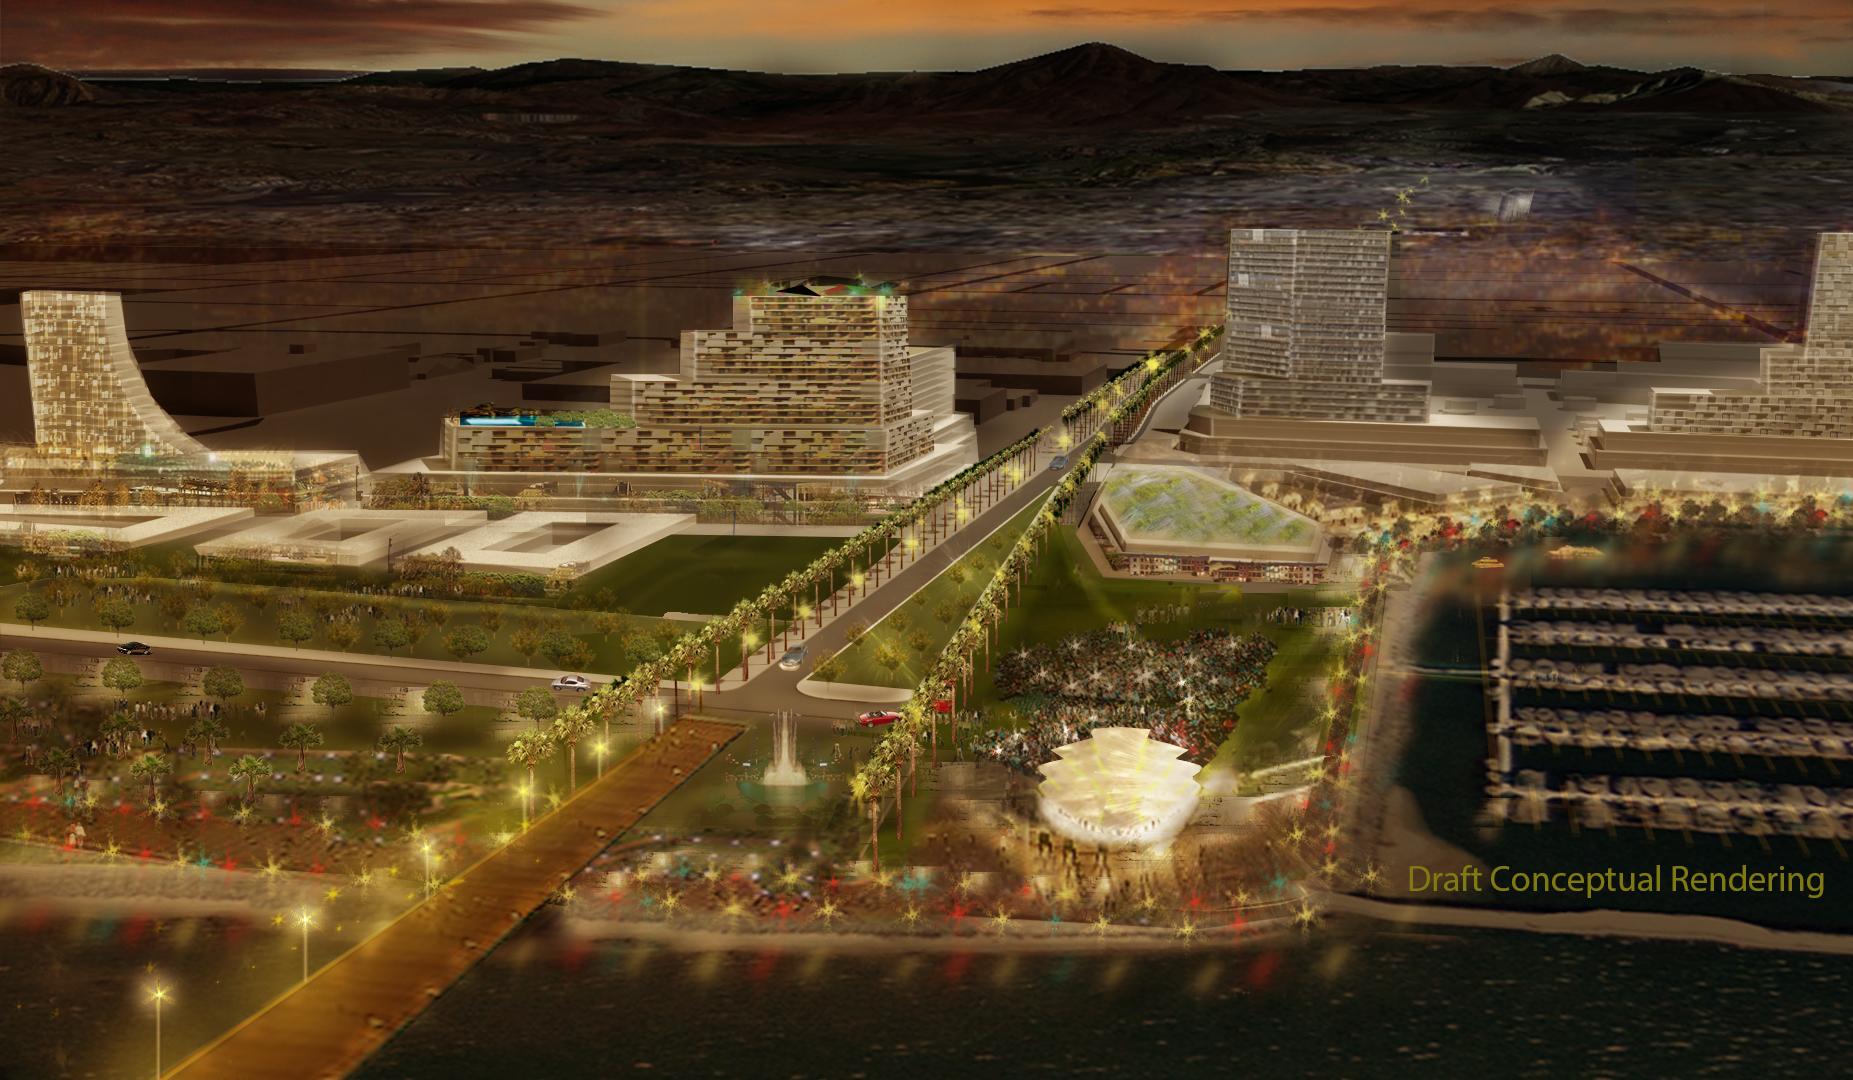 Chula Vista Bayfront Master Plan Receives Award